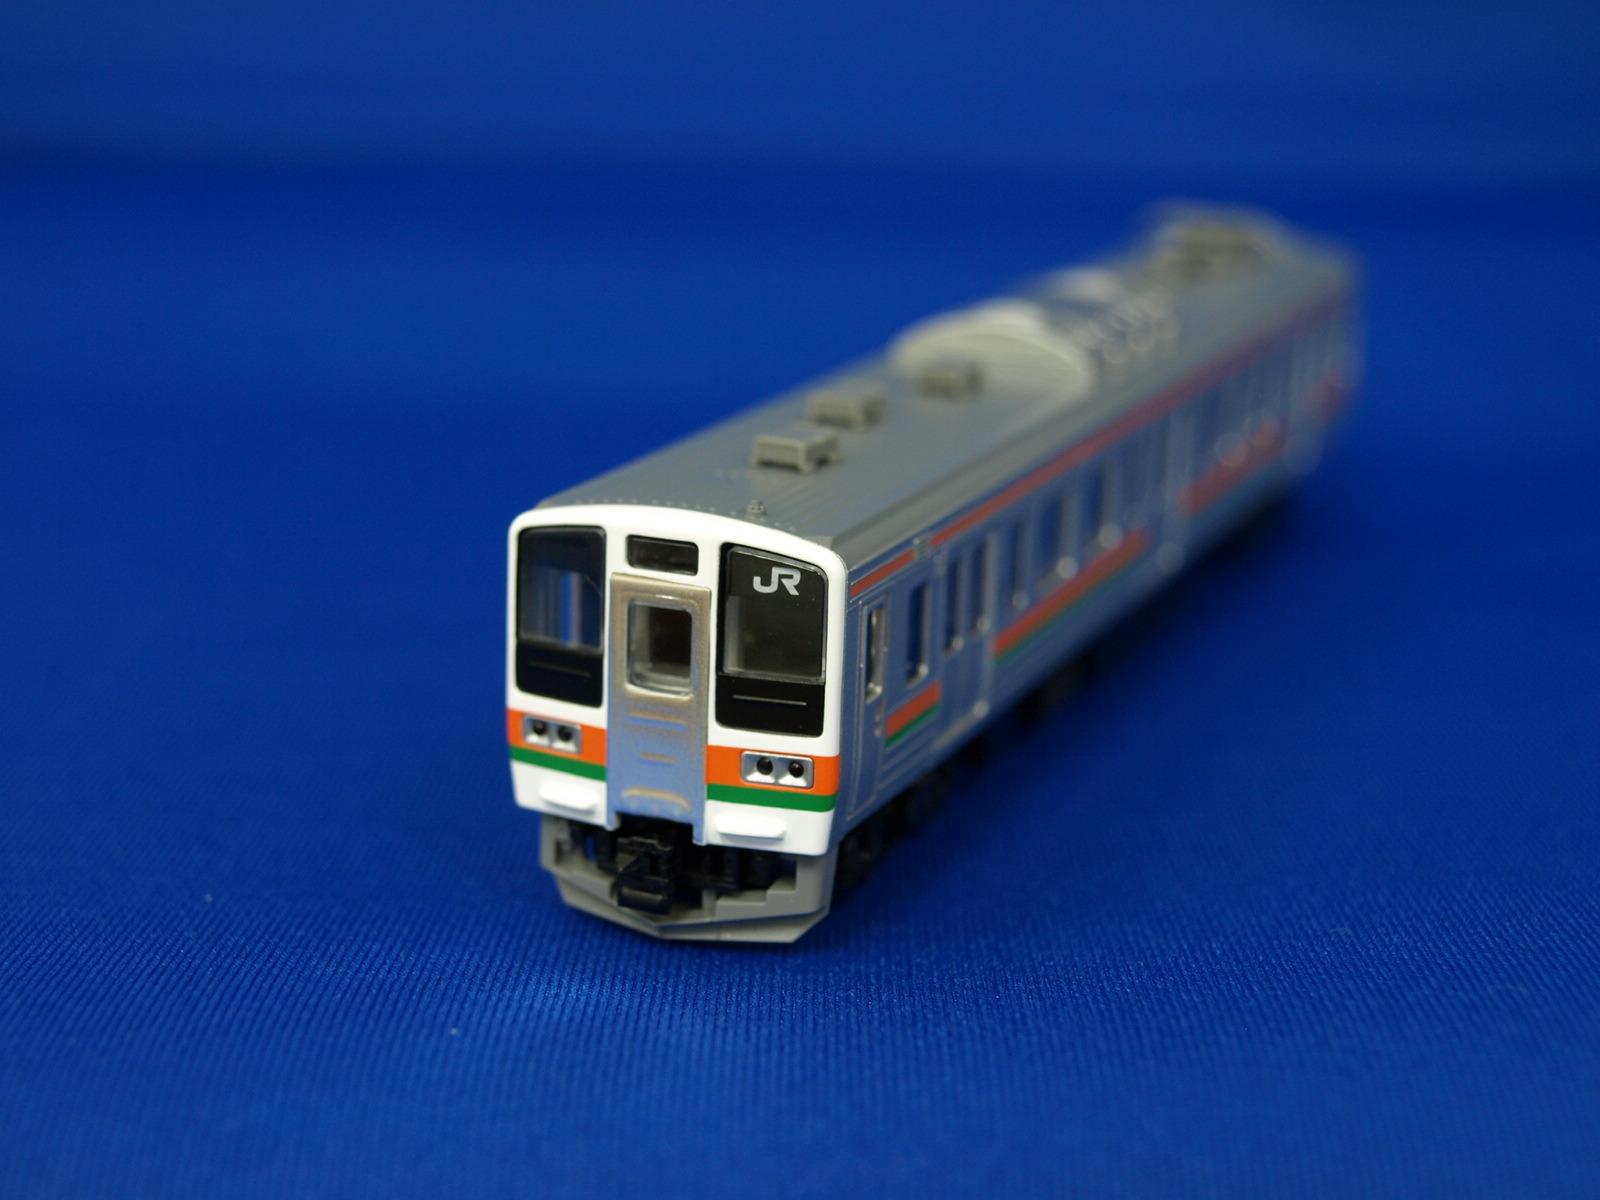 Nゲージ トミックス 98646 JR 211-3000系近郊電車(高崎車両センター・6両編成)セット